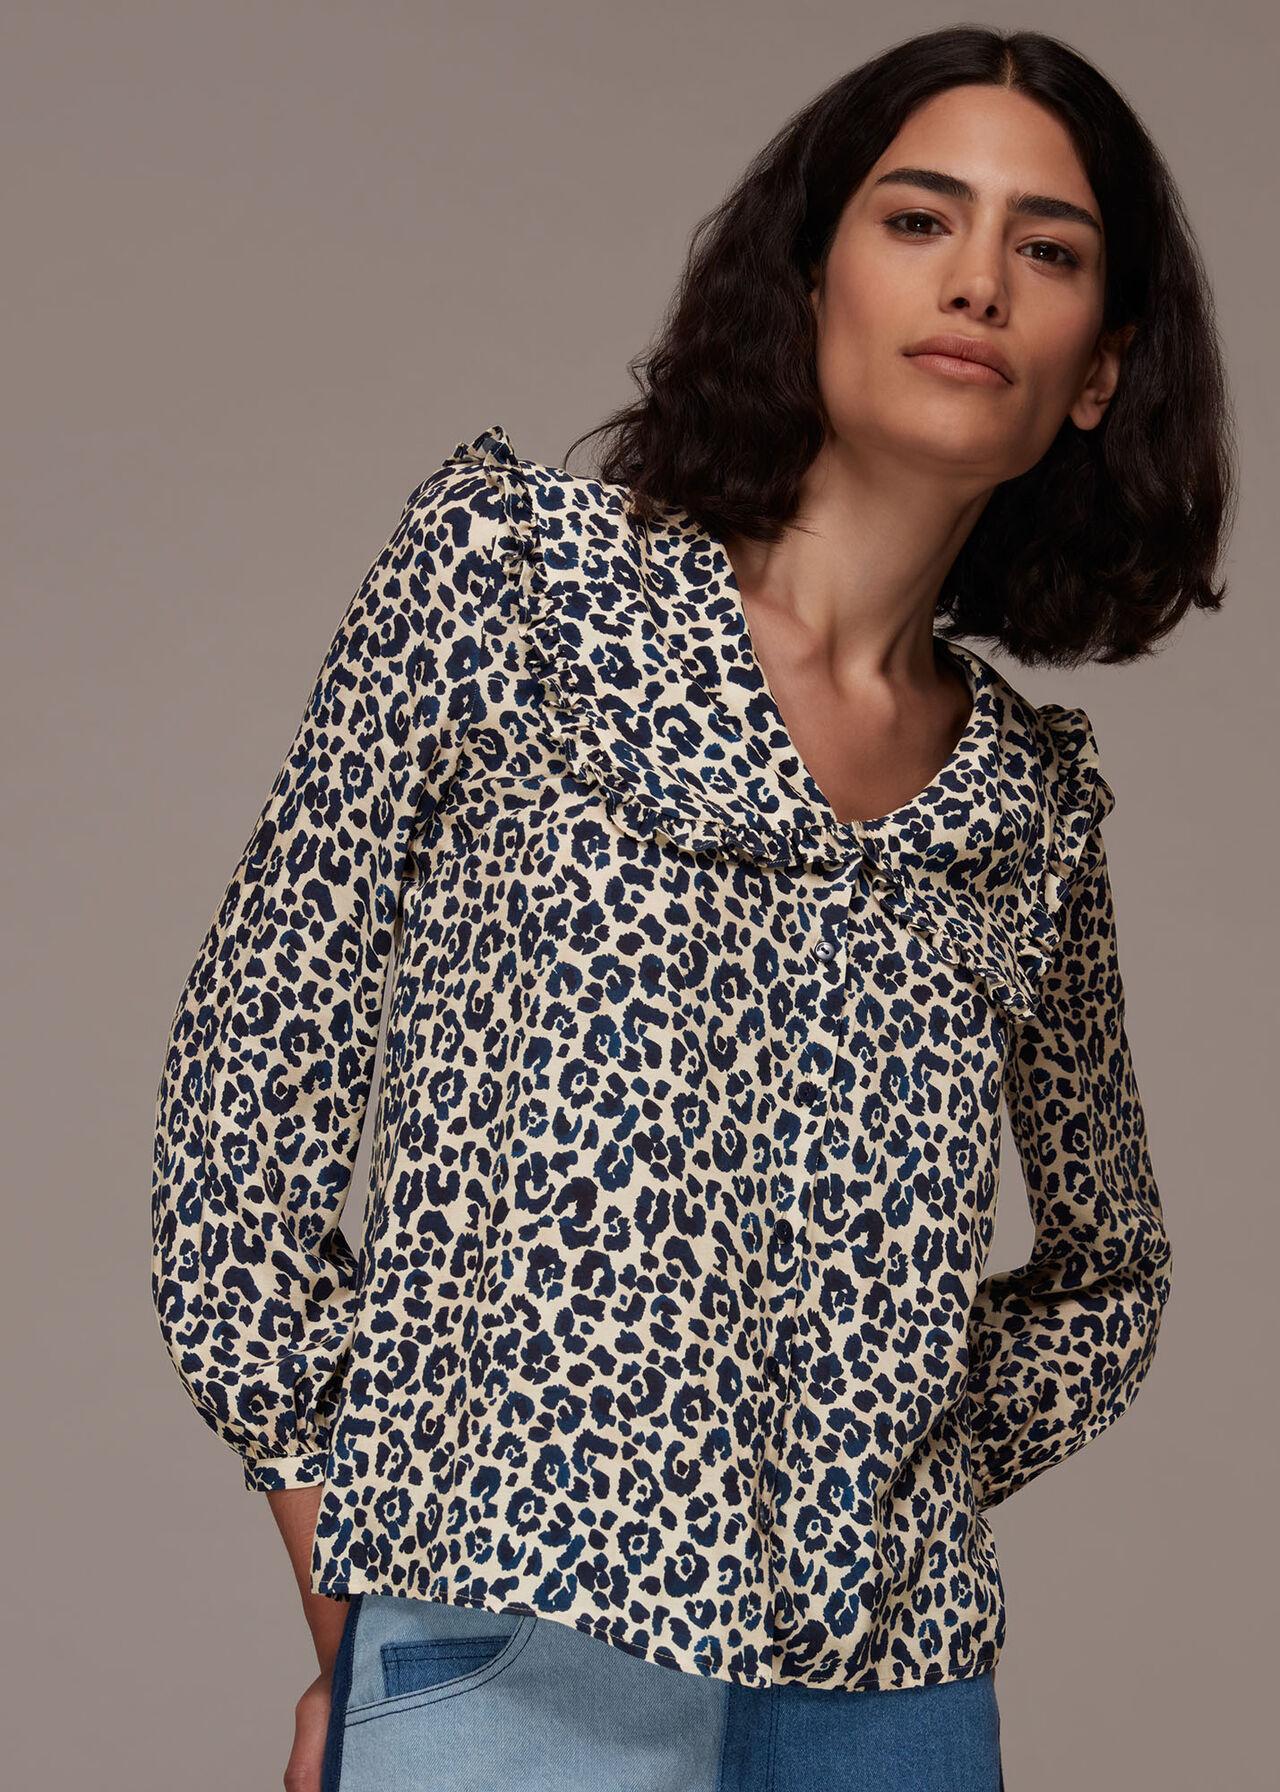 Cheetah Print Collar Top